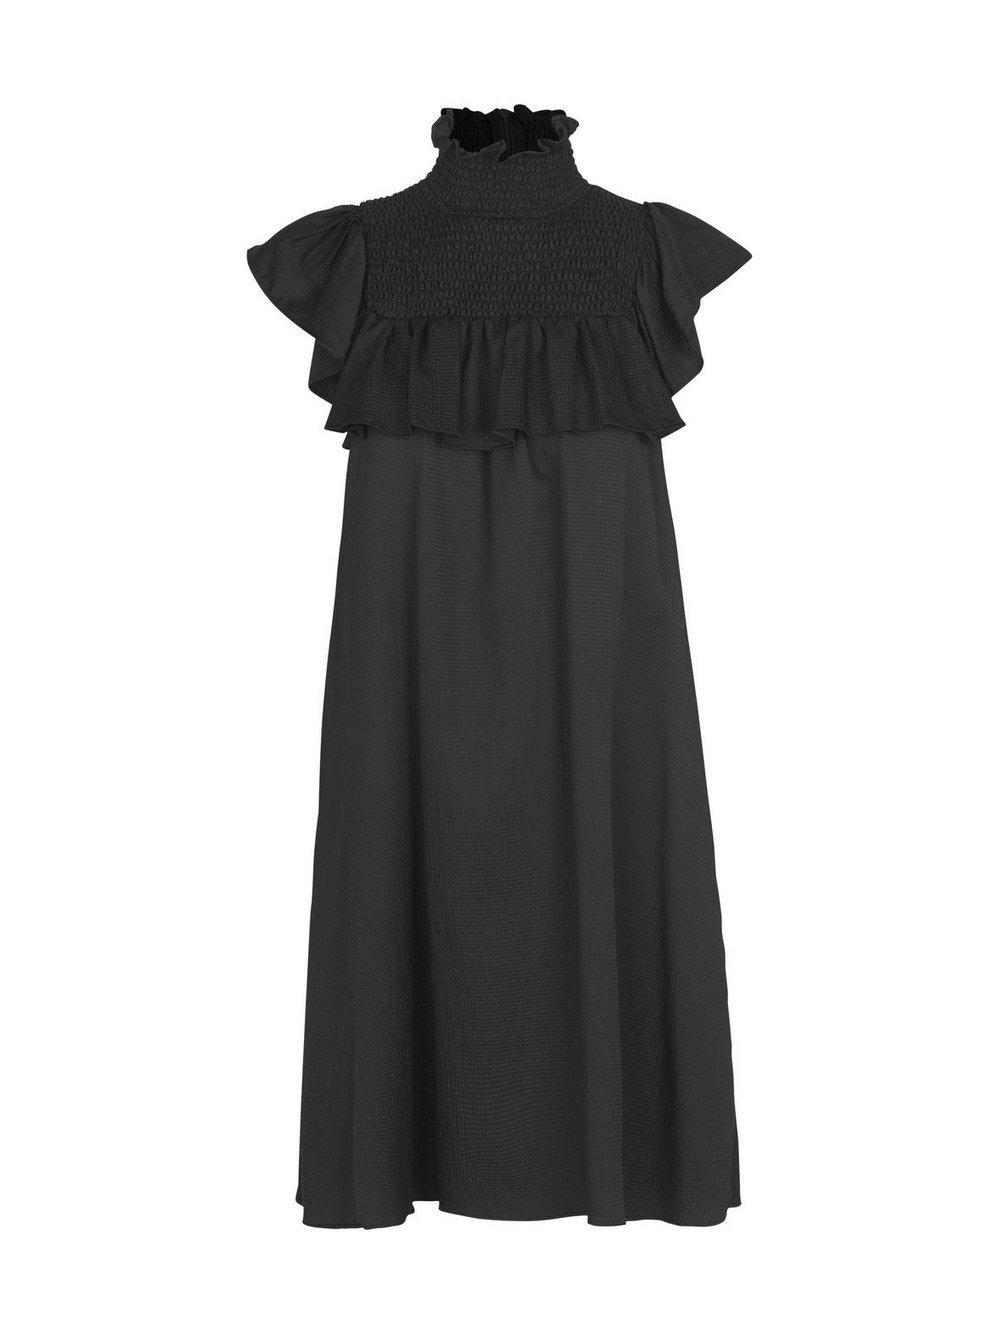 Aelaney High Neck Dress Item # 21233